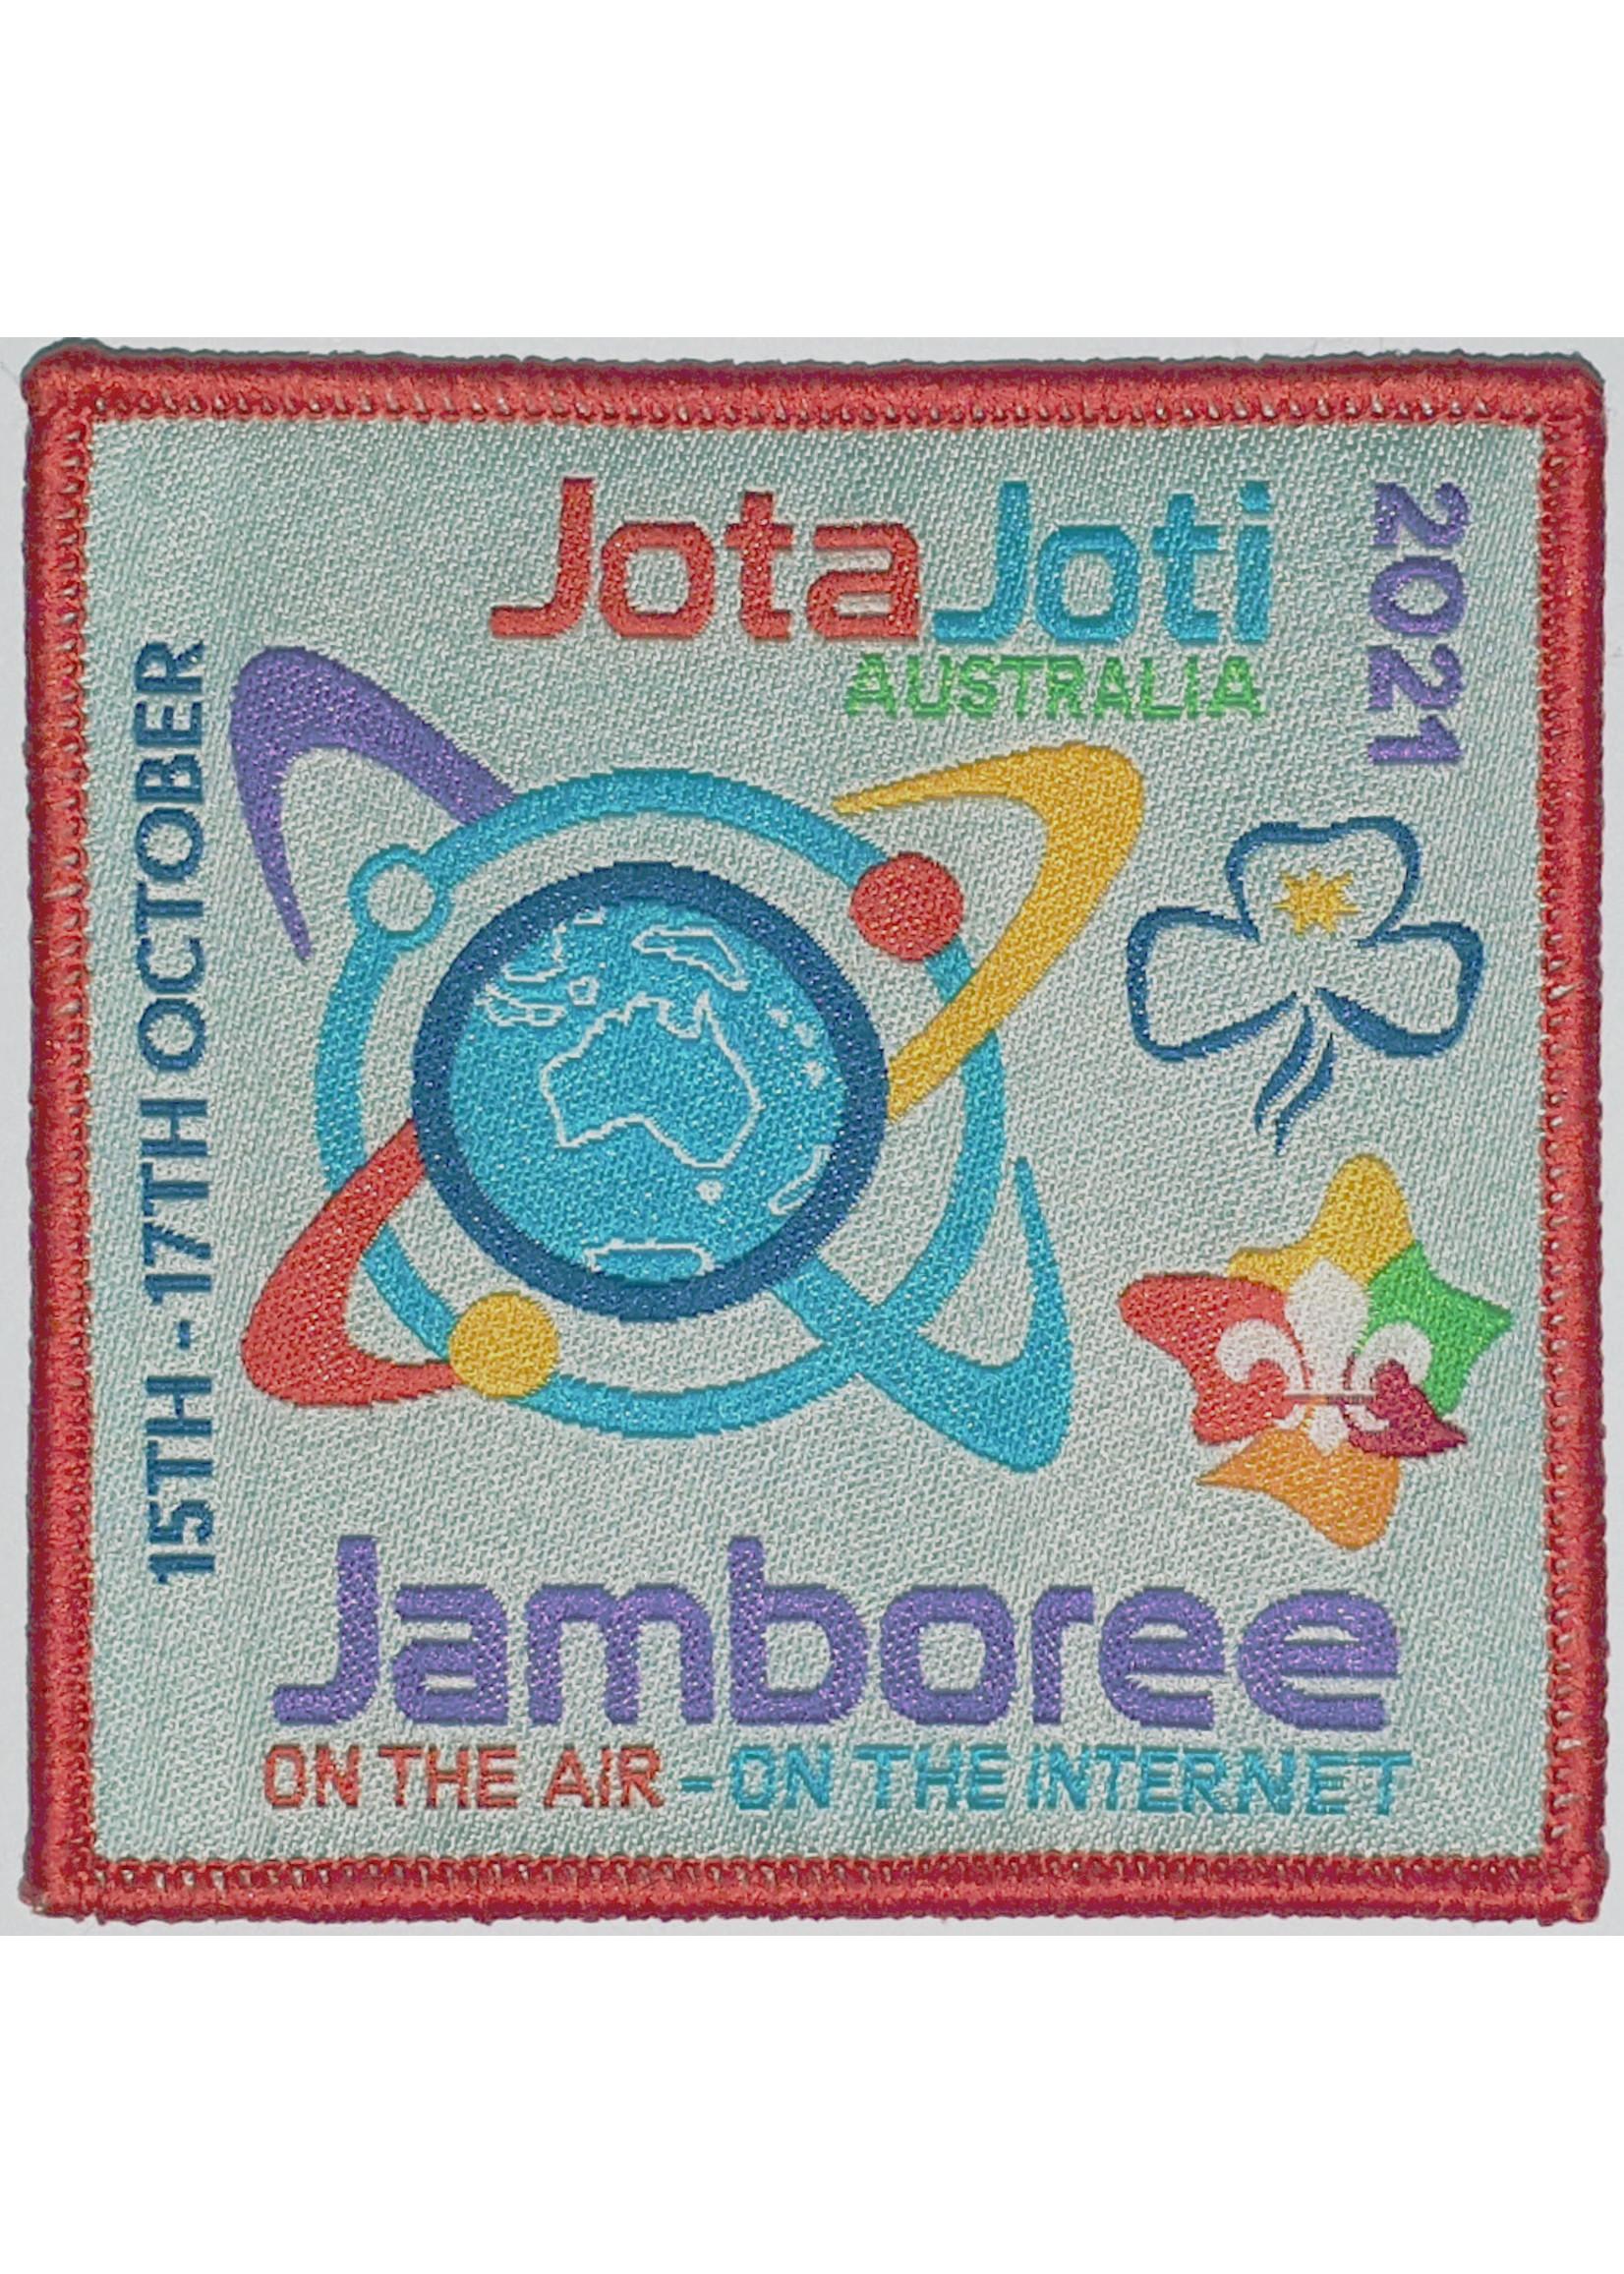 2021 JOTA/JOTI Badge